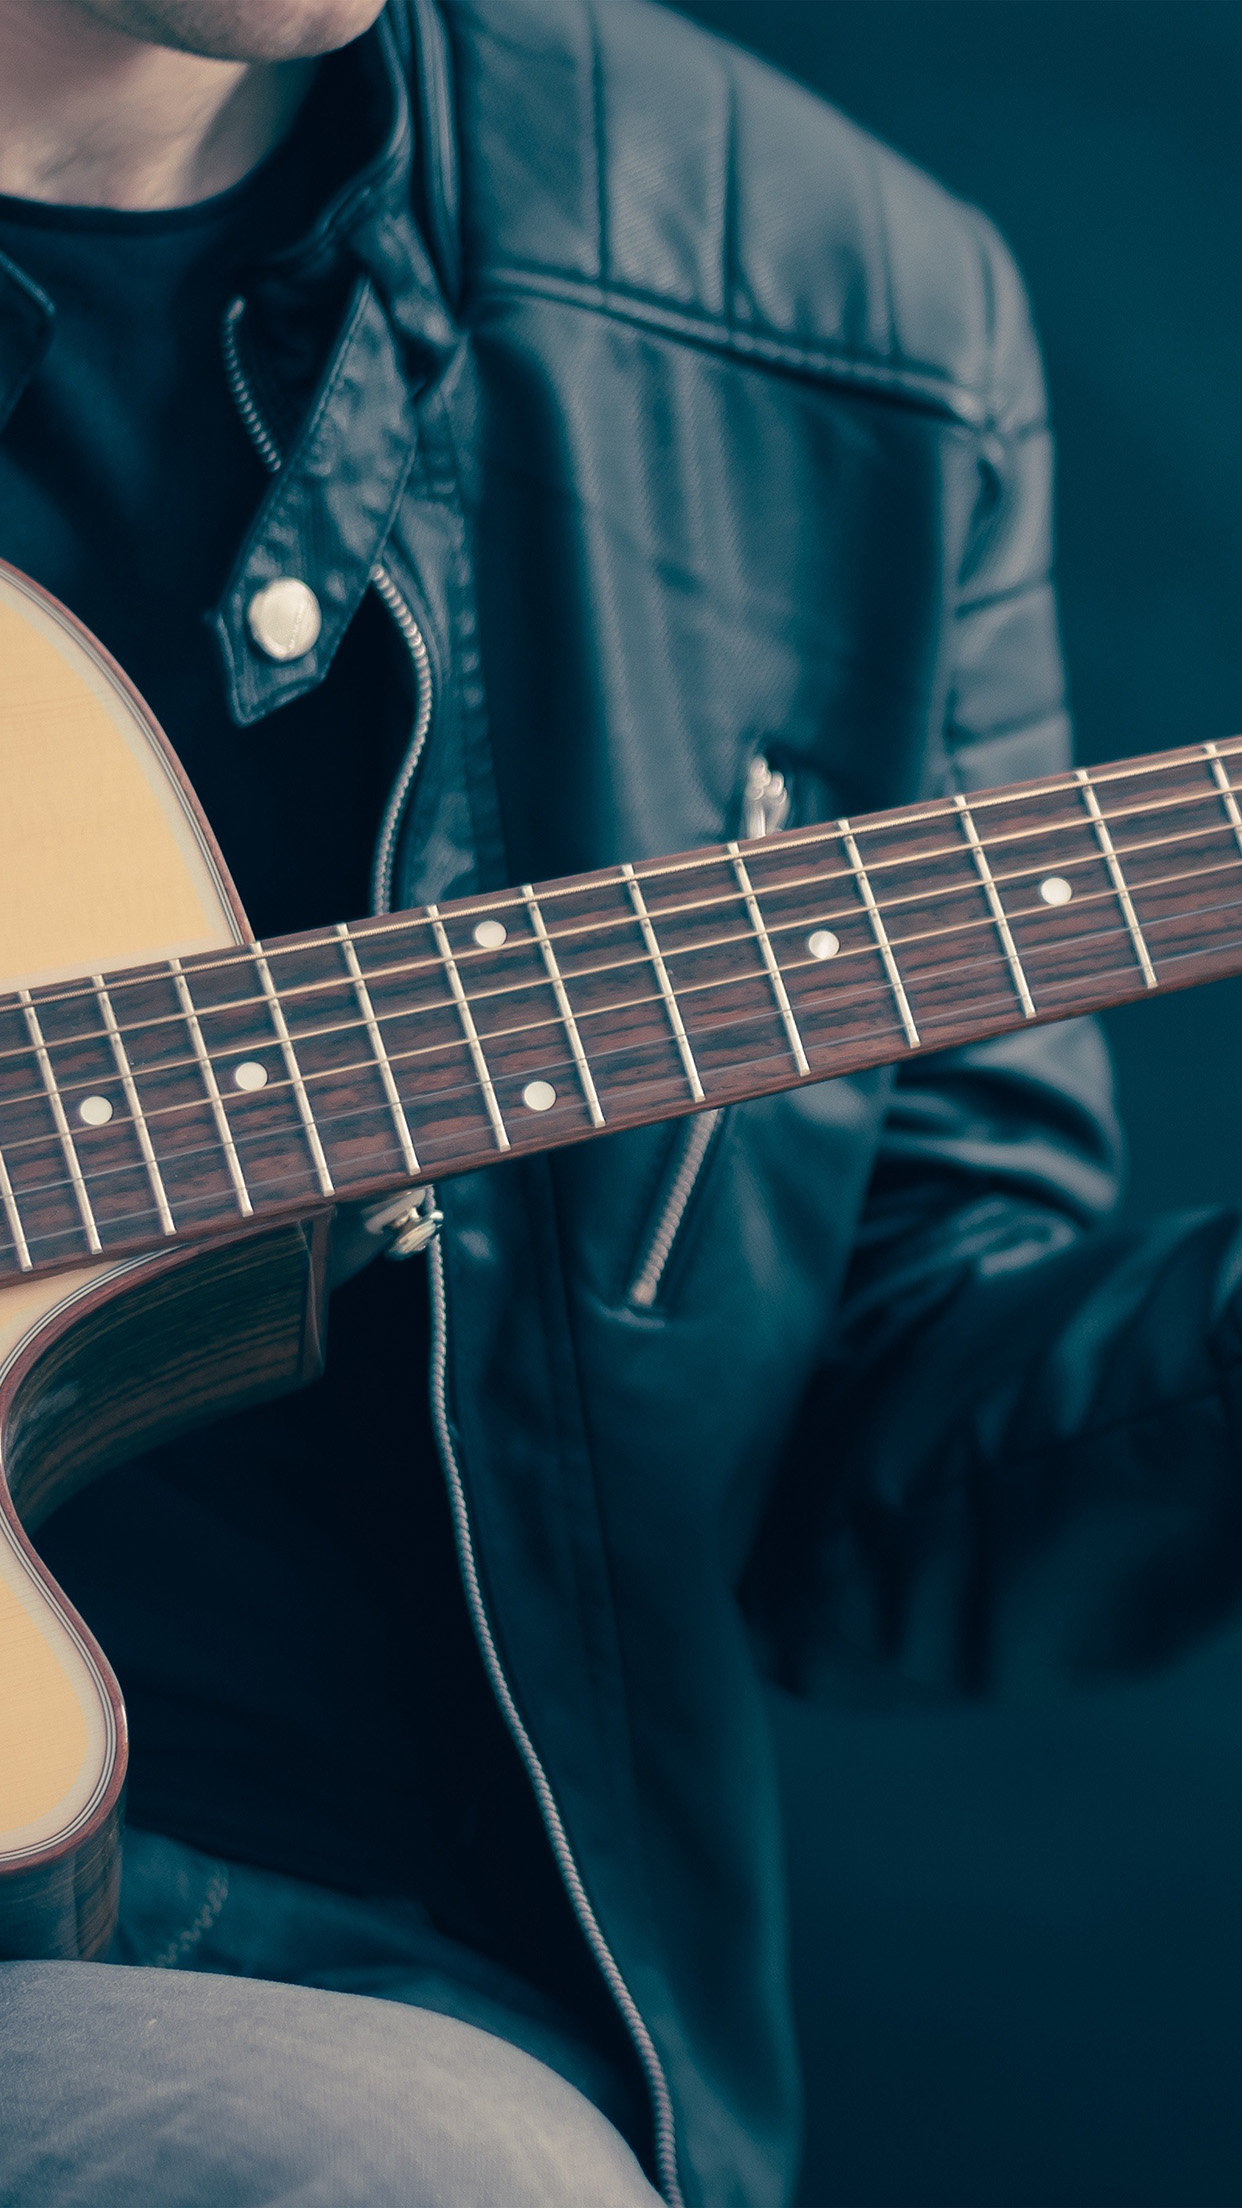 Iphone7papers Com Iphone7 Wallpaper Nc10 Guitar